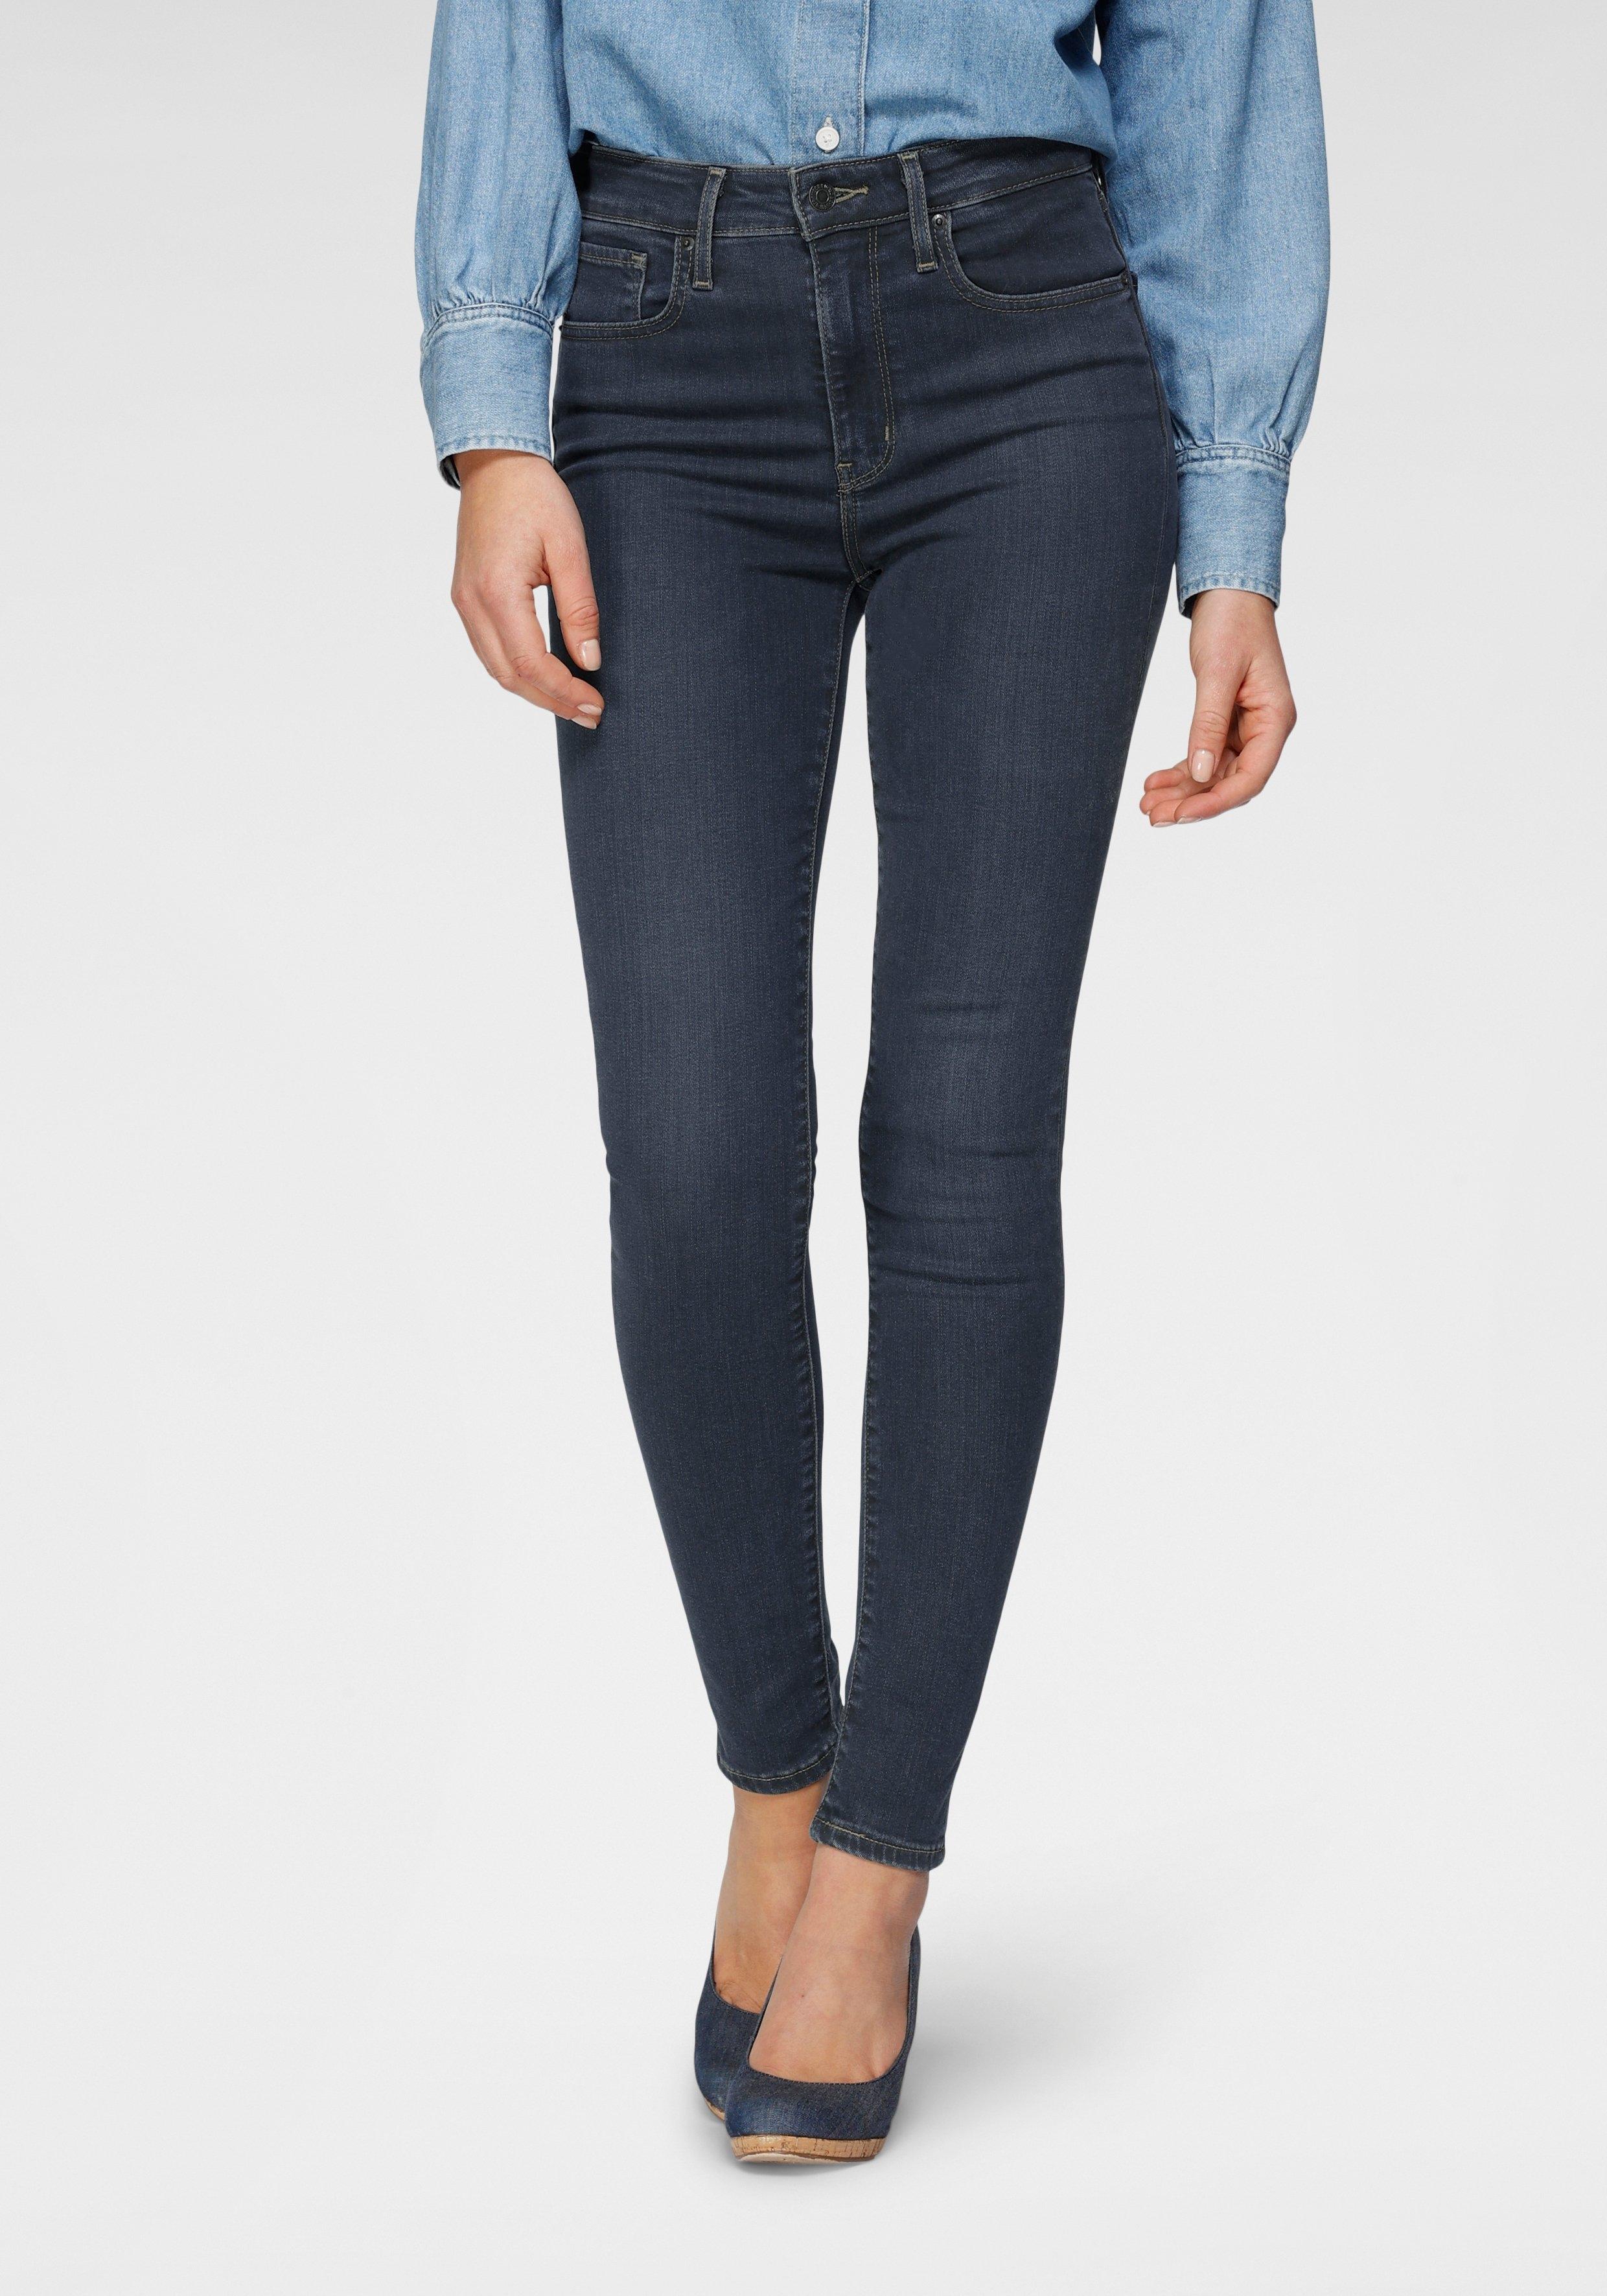 Levi's skinny fit jeans 721 High rise skinny met hoge band - gratis ruilen op otto.nl